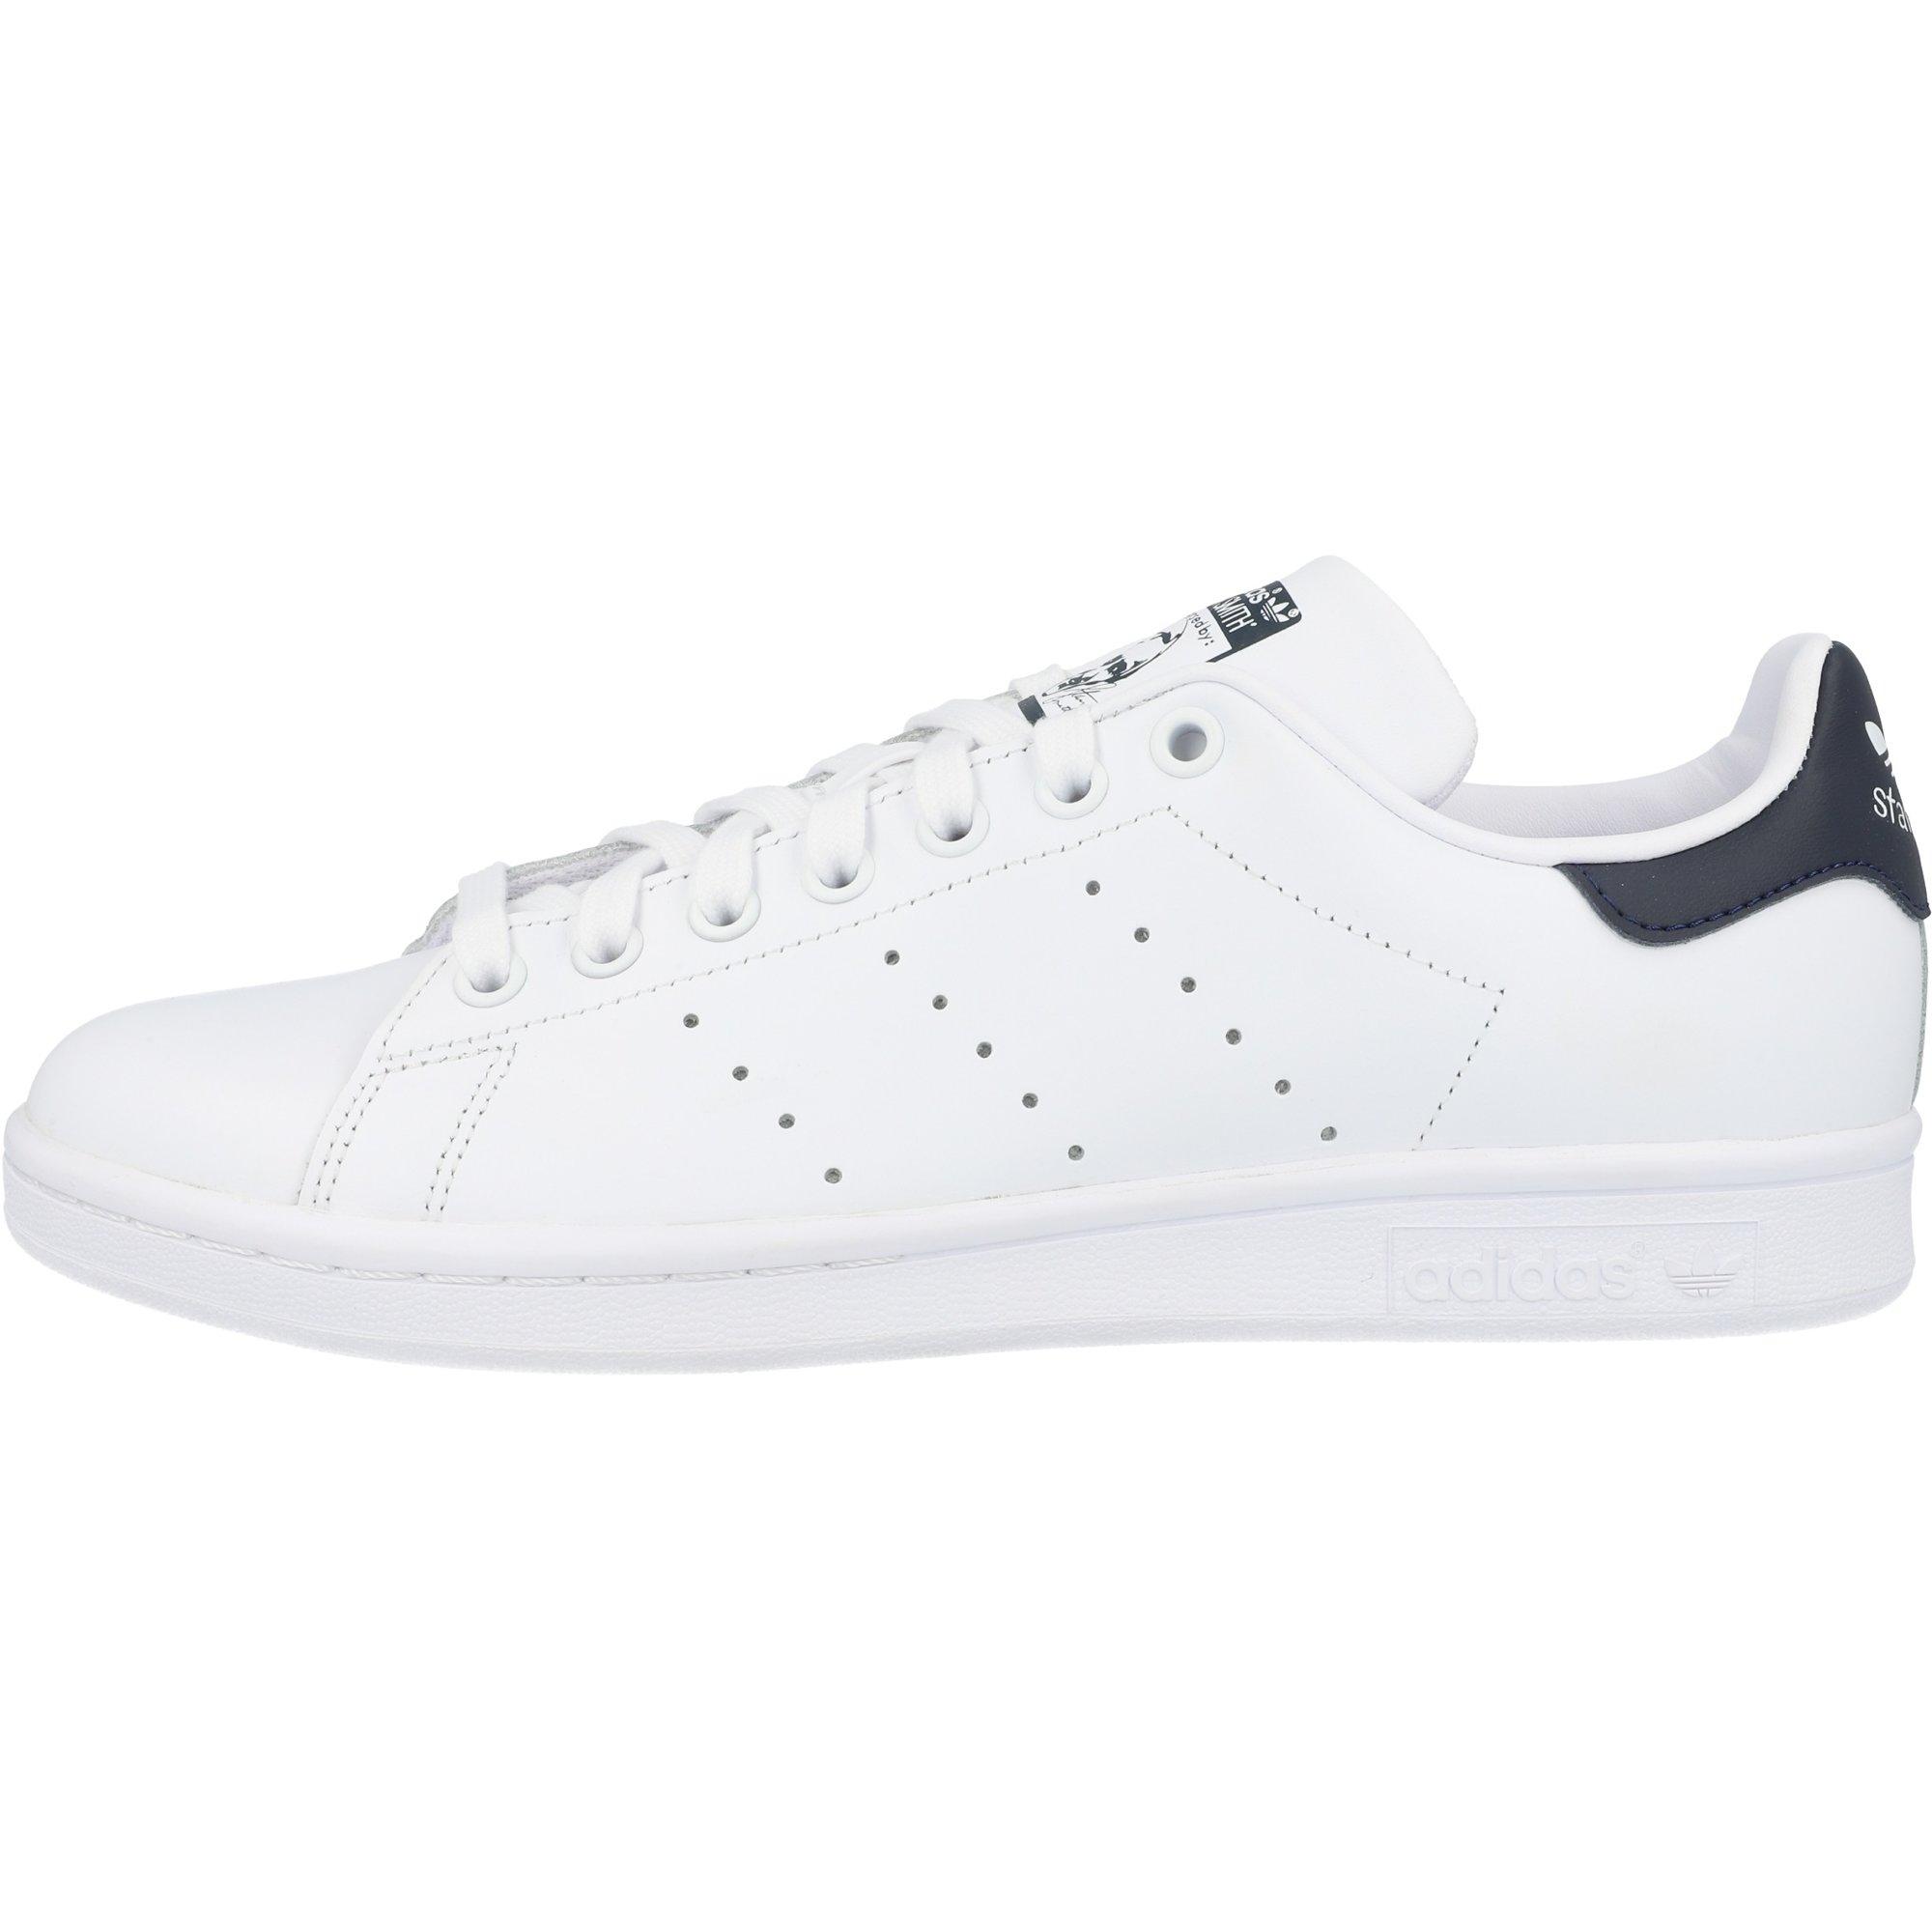 adidas Originals Stan Smith Core White/Dark Blue Leather